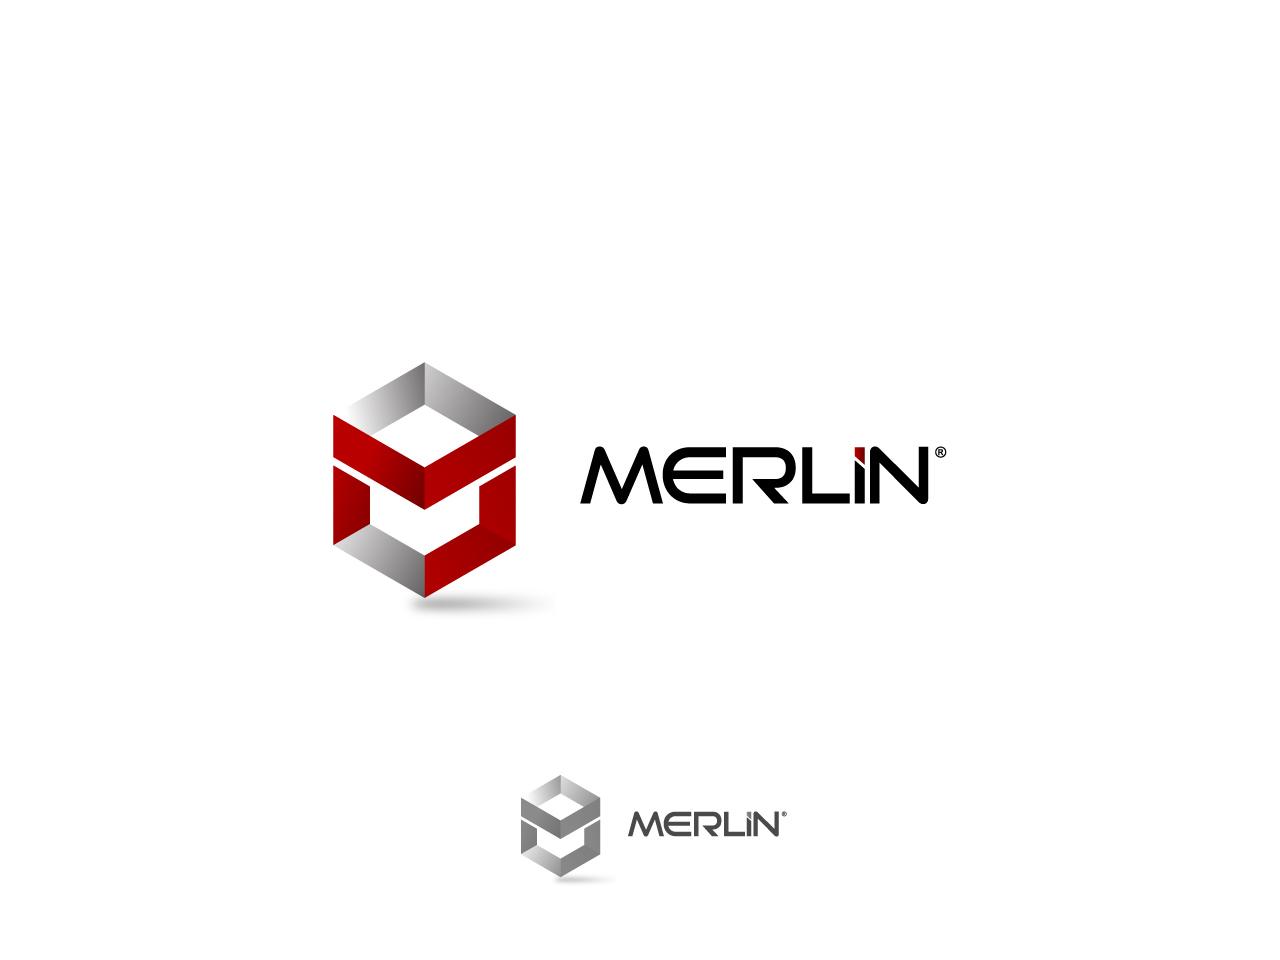 Logo Design by jpbituin - Entry No. 127 in the Logo Design Contest Imaginative Logo Design for Merlin.